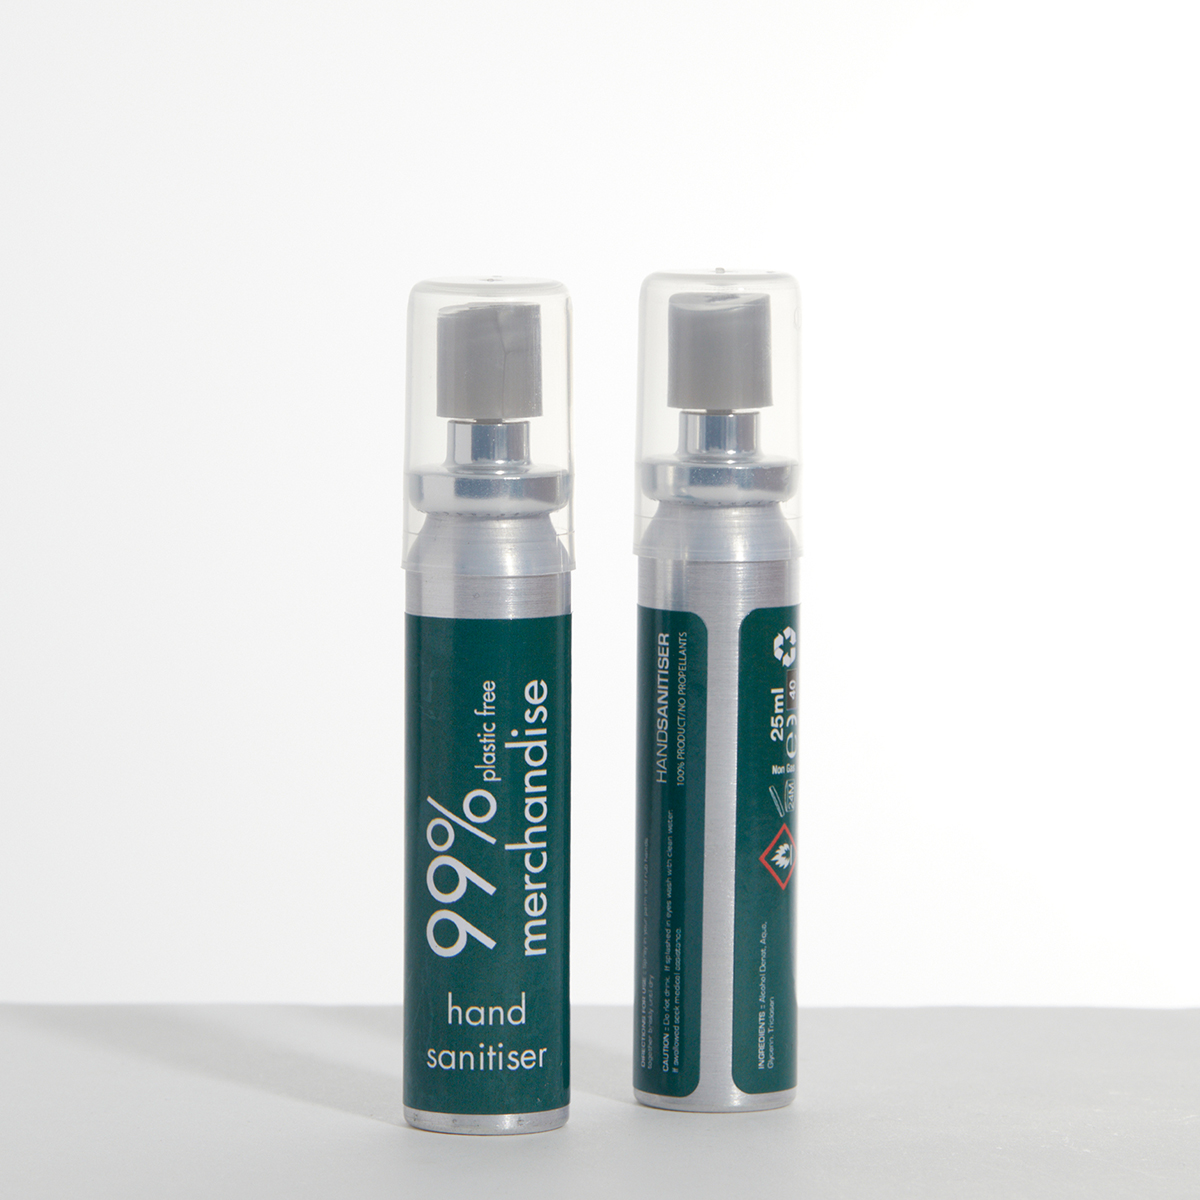 Hand Sanitizer in Aluminium Bottle 70% Alcohol